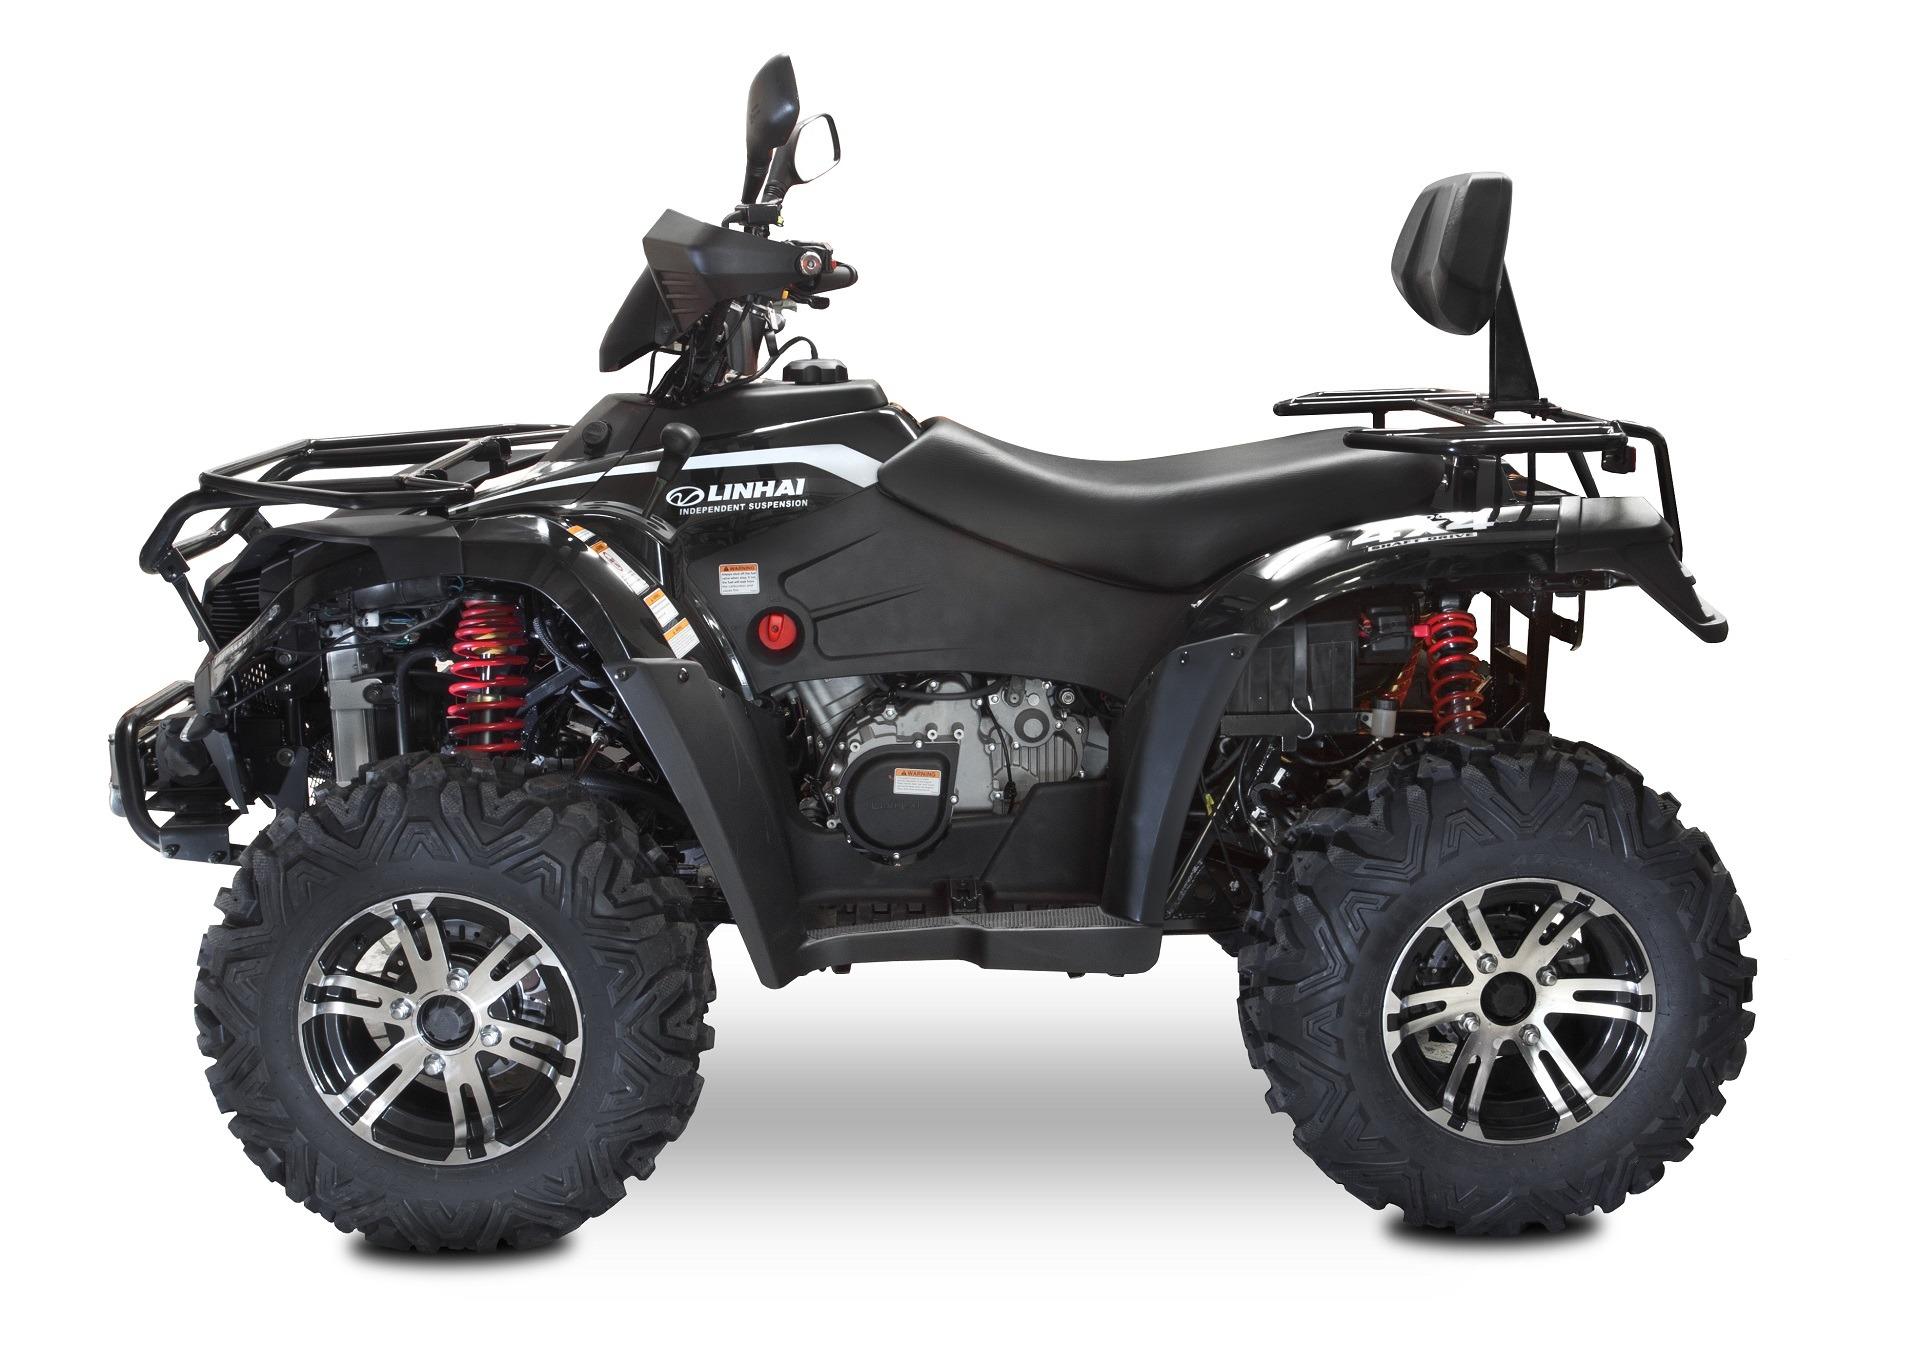 Linhai_500_4WD_b1_black